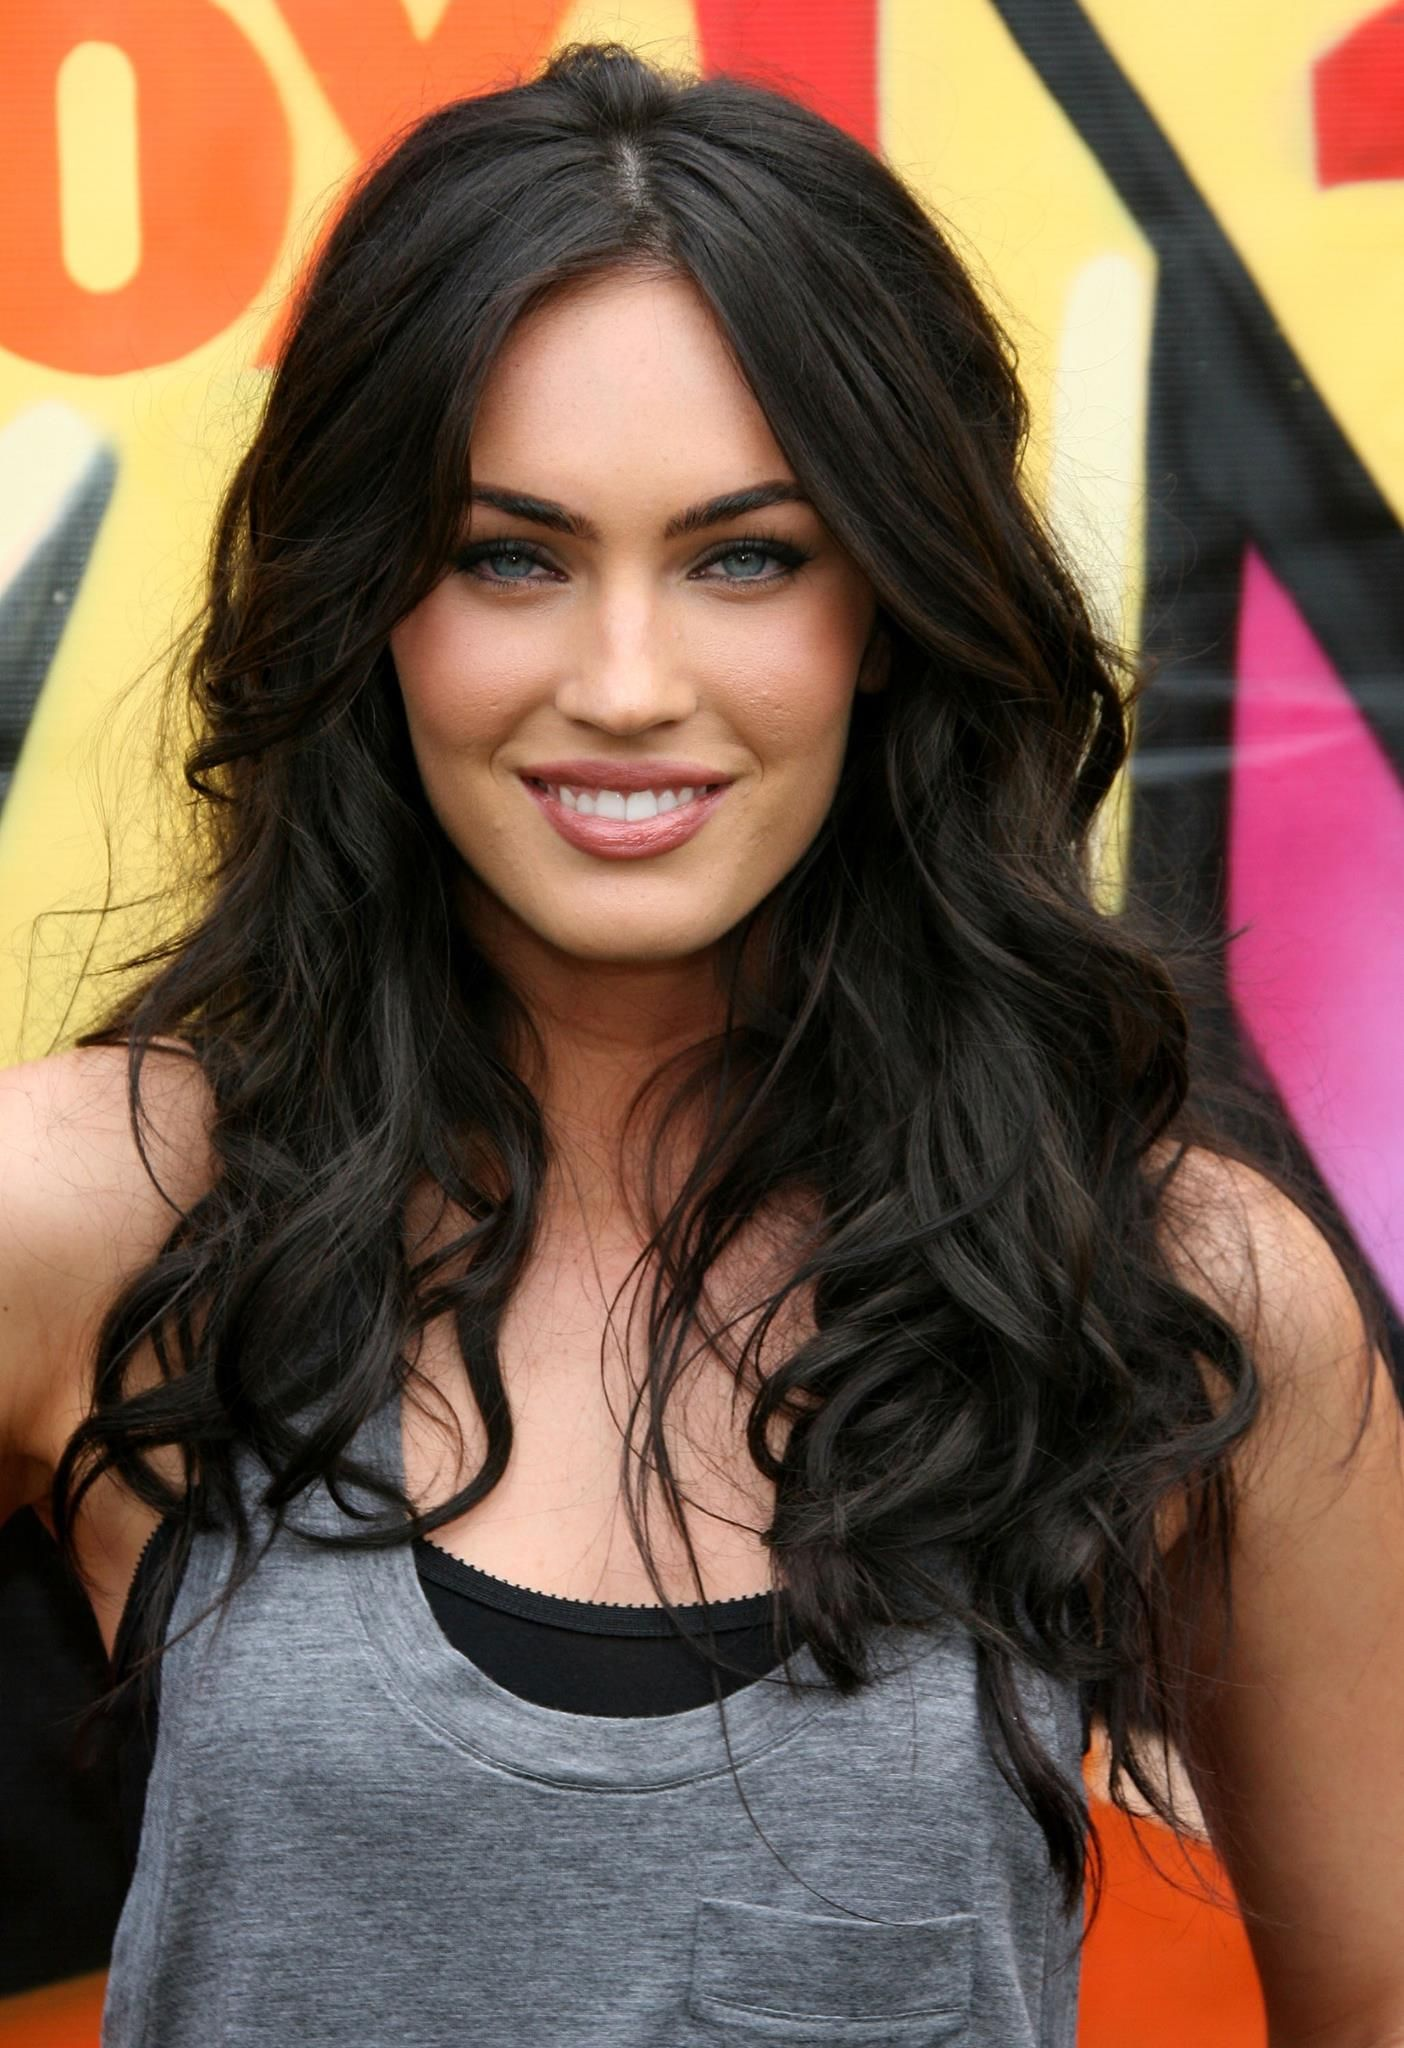 Megan Fox Megan Fox Hair Party Hairstyles For Long Hair Long Hair Styles